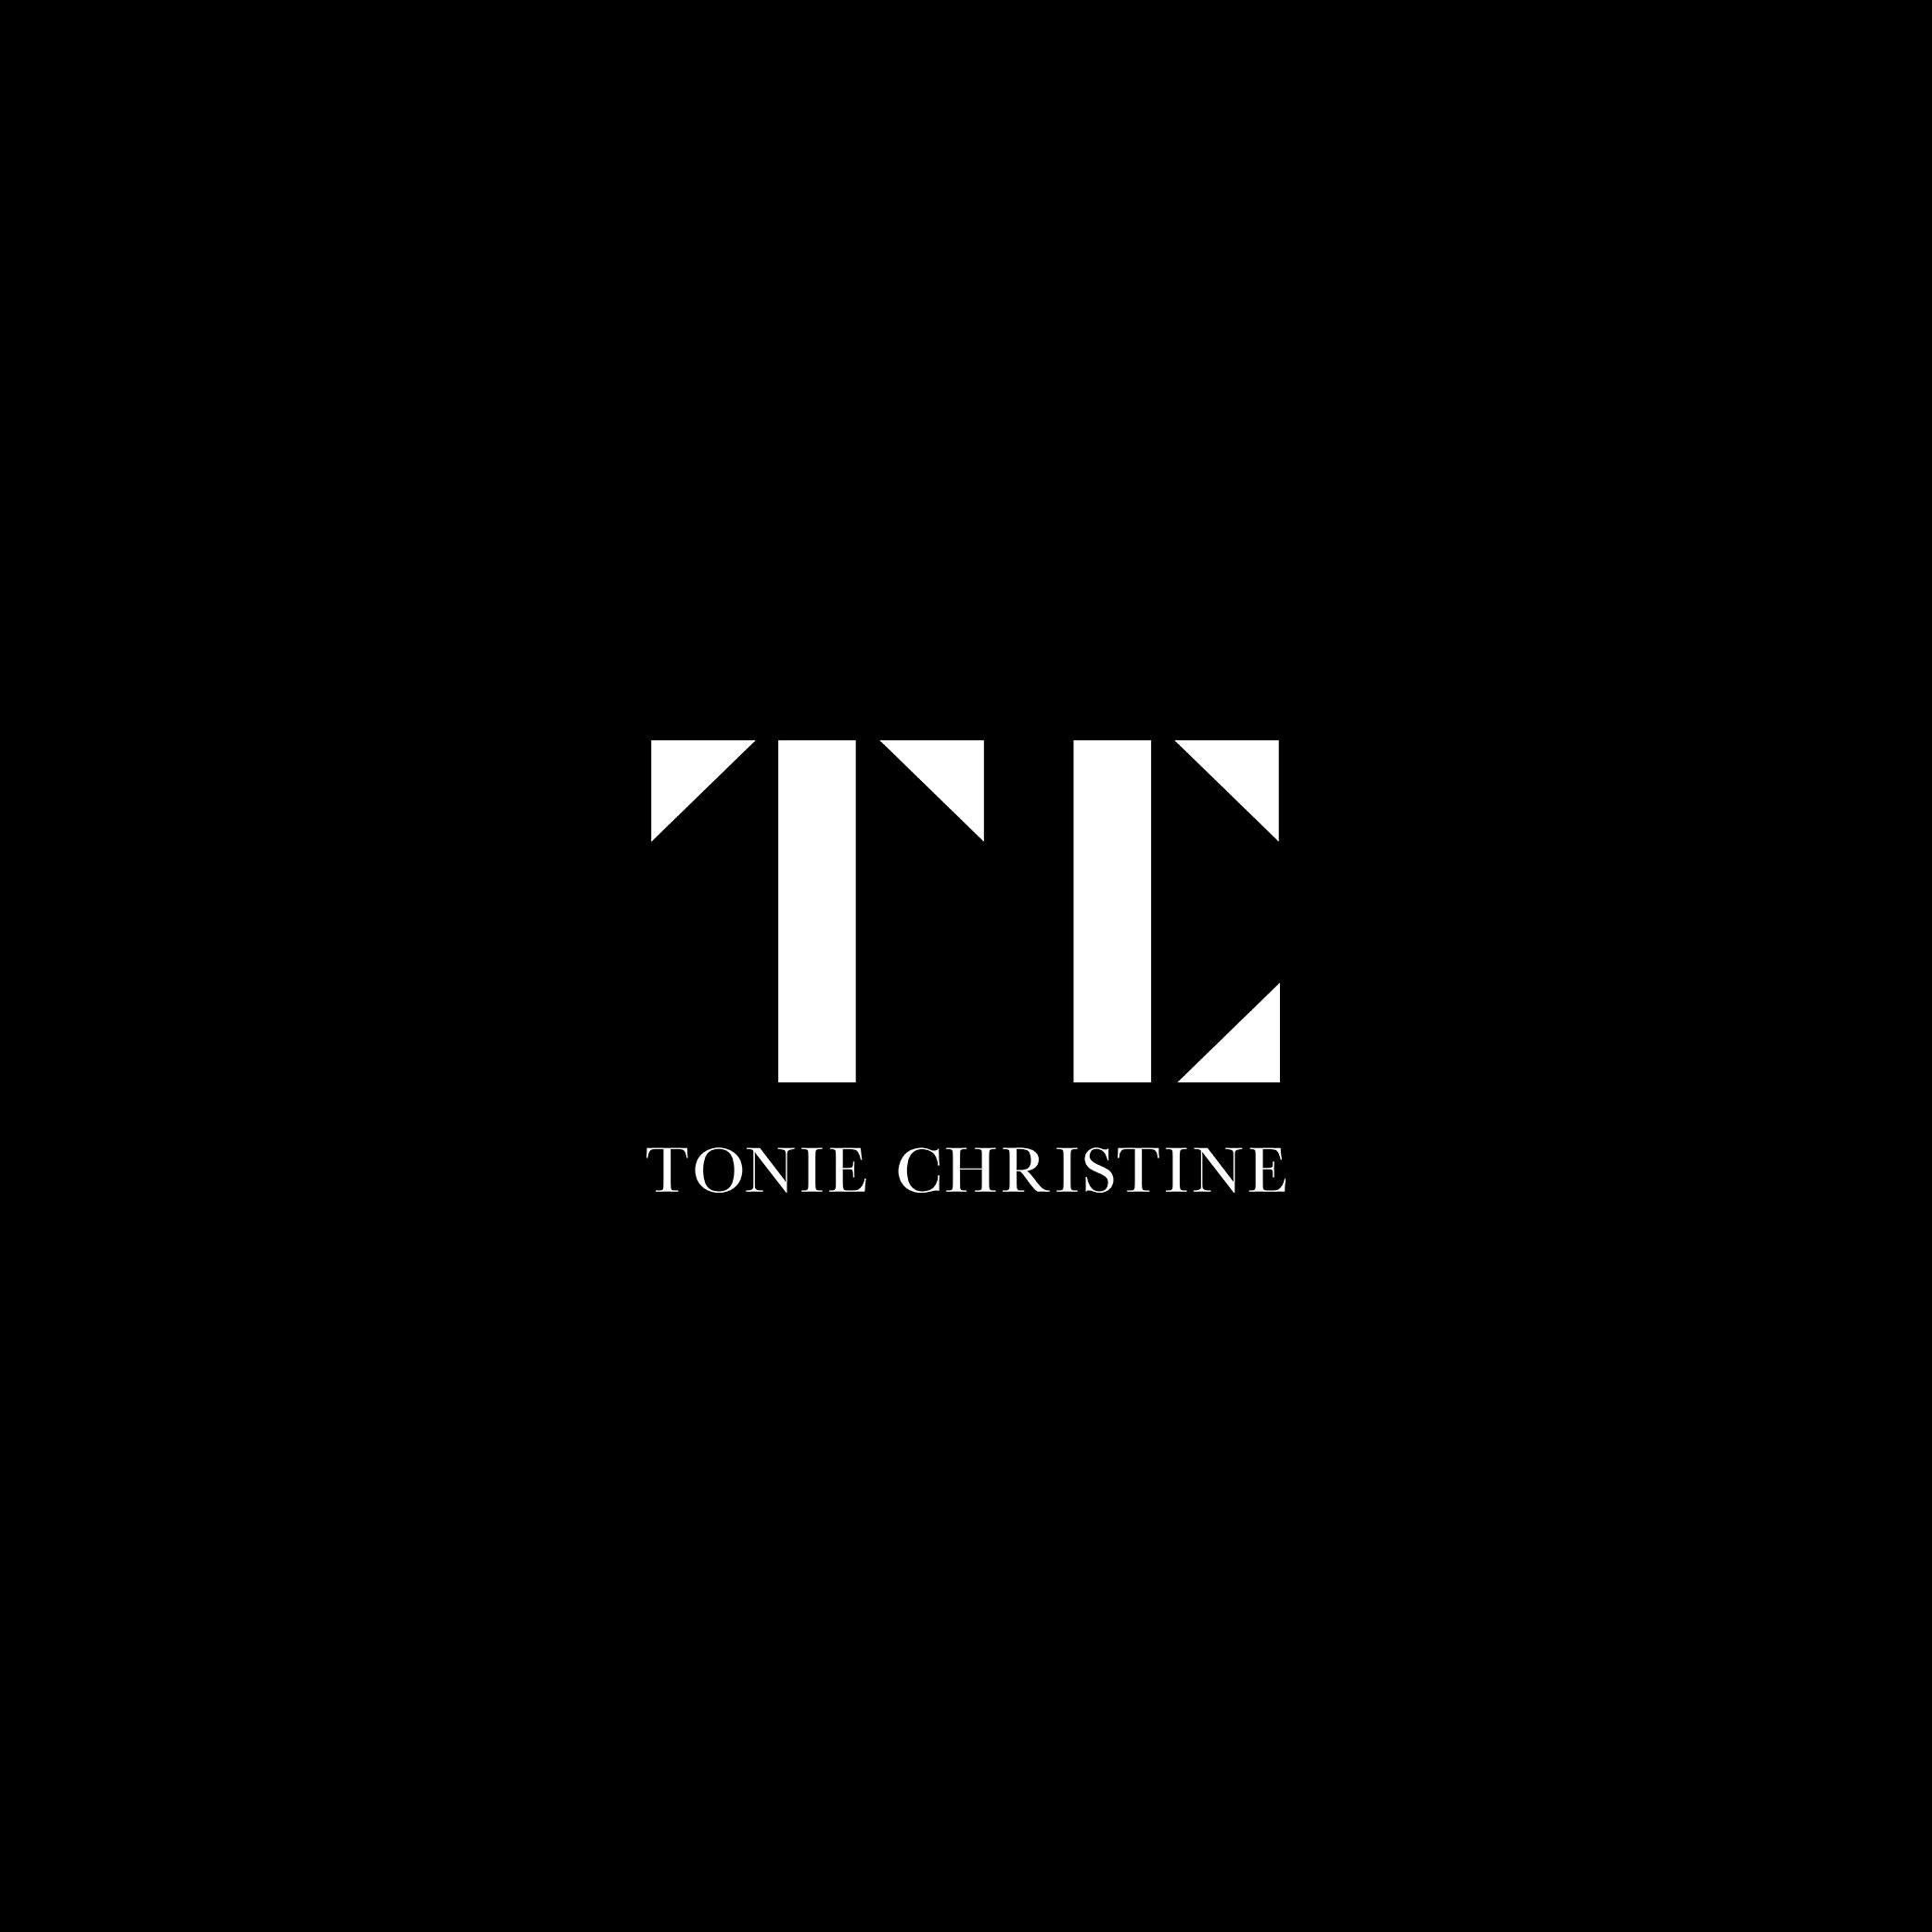 TonieChristine_logo_mockup.jpg